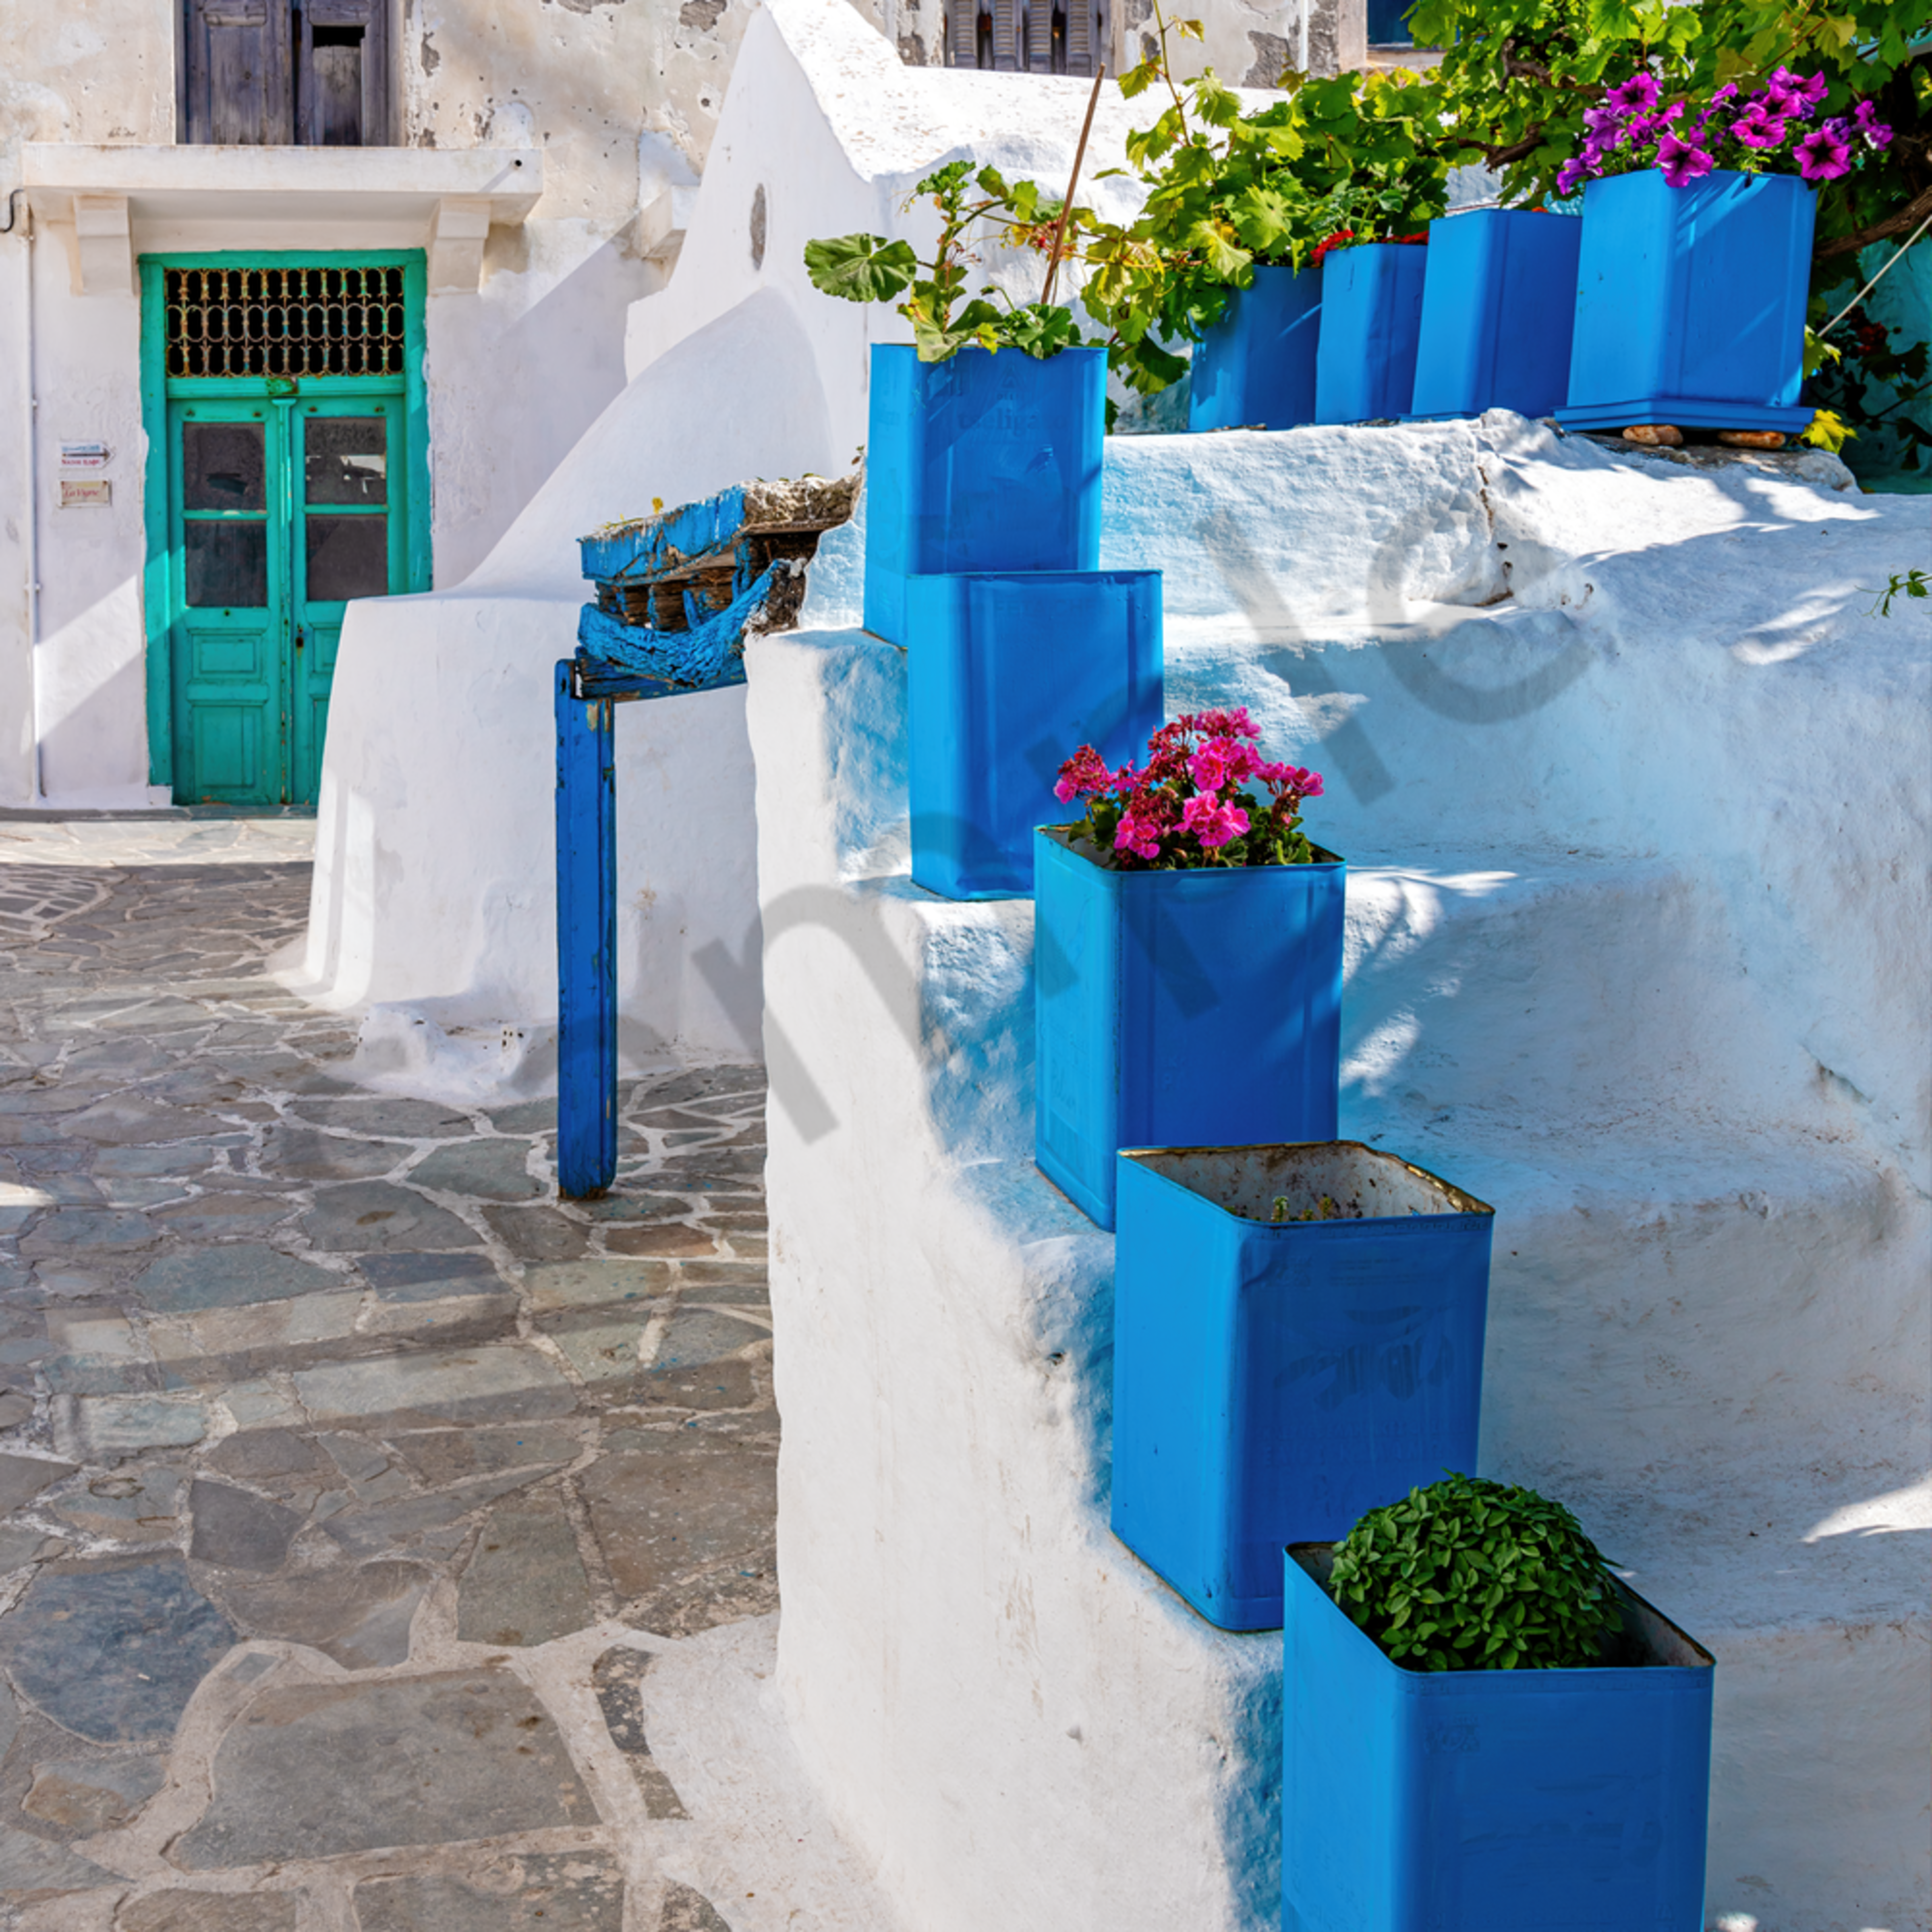 Blue pots and doors naxos greece szxbry